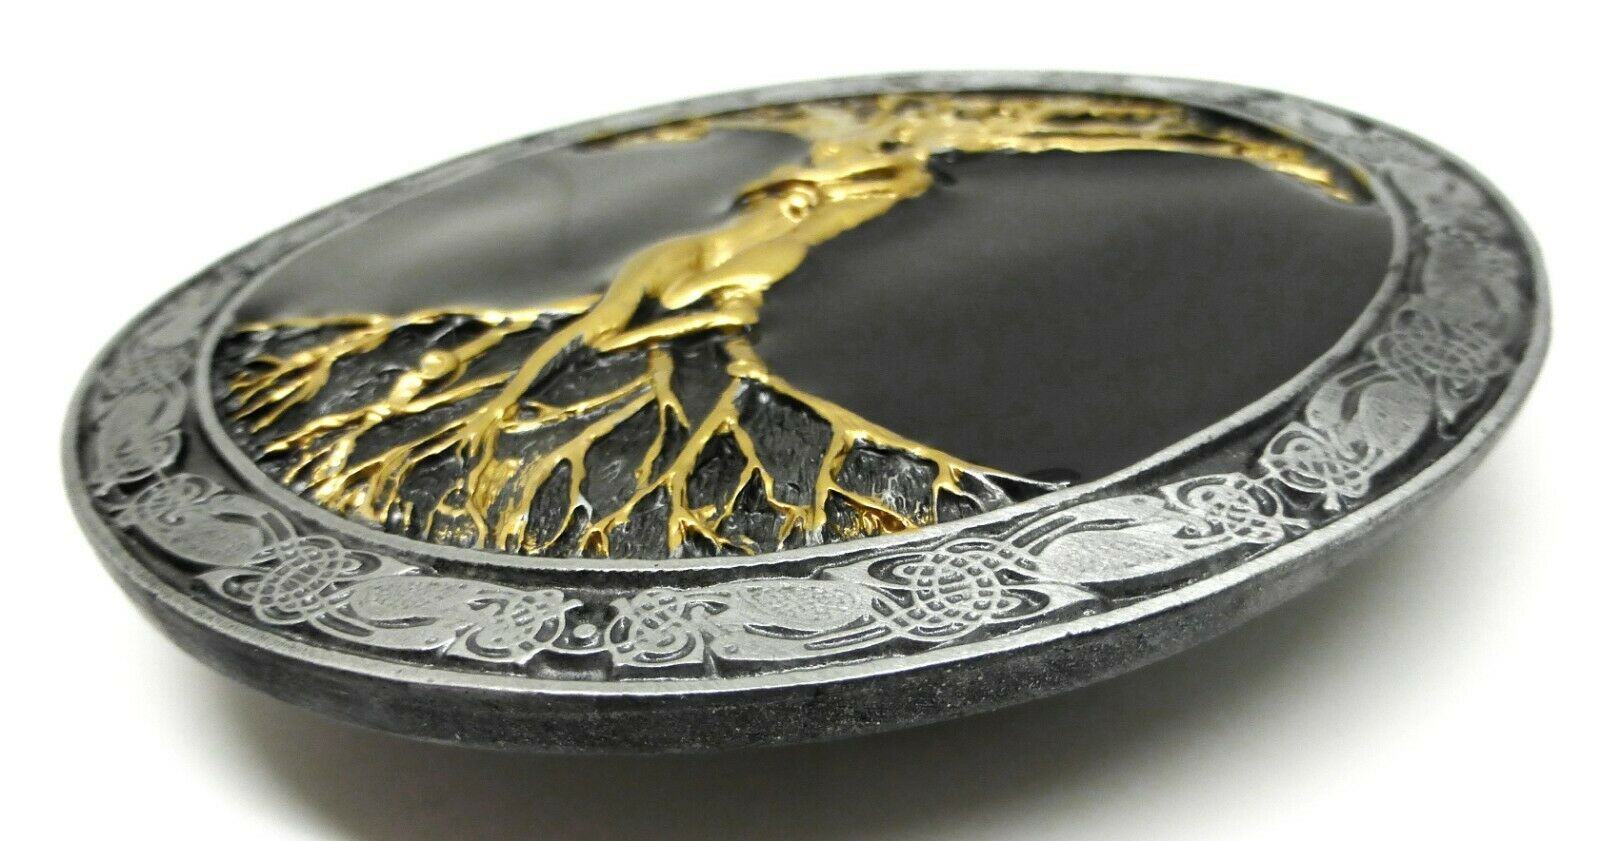 The Tree Of Life Belt Buckle Artistic Black & Gold Design Authentic Bergamot